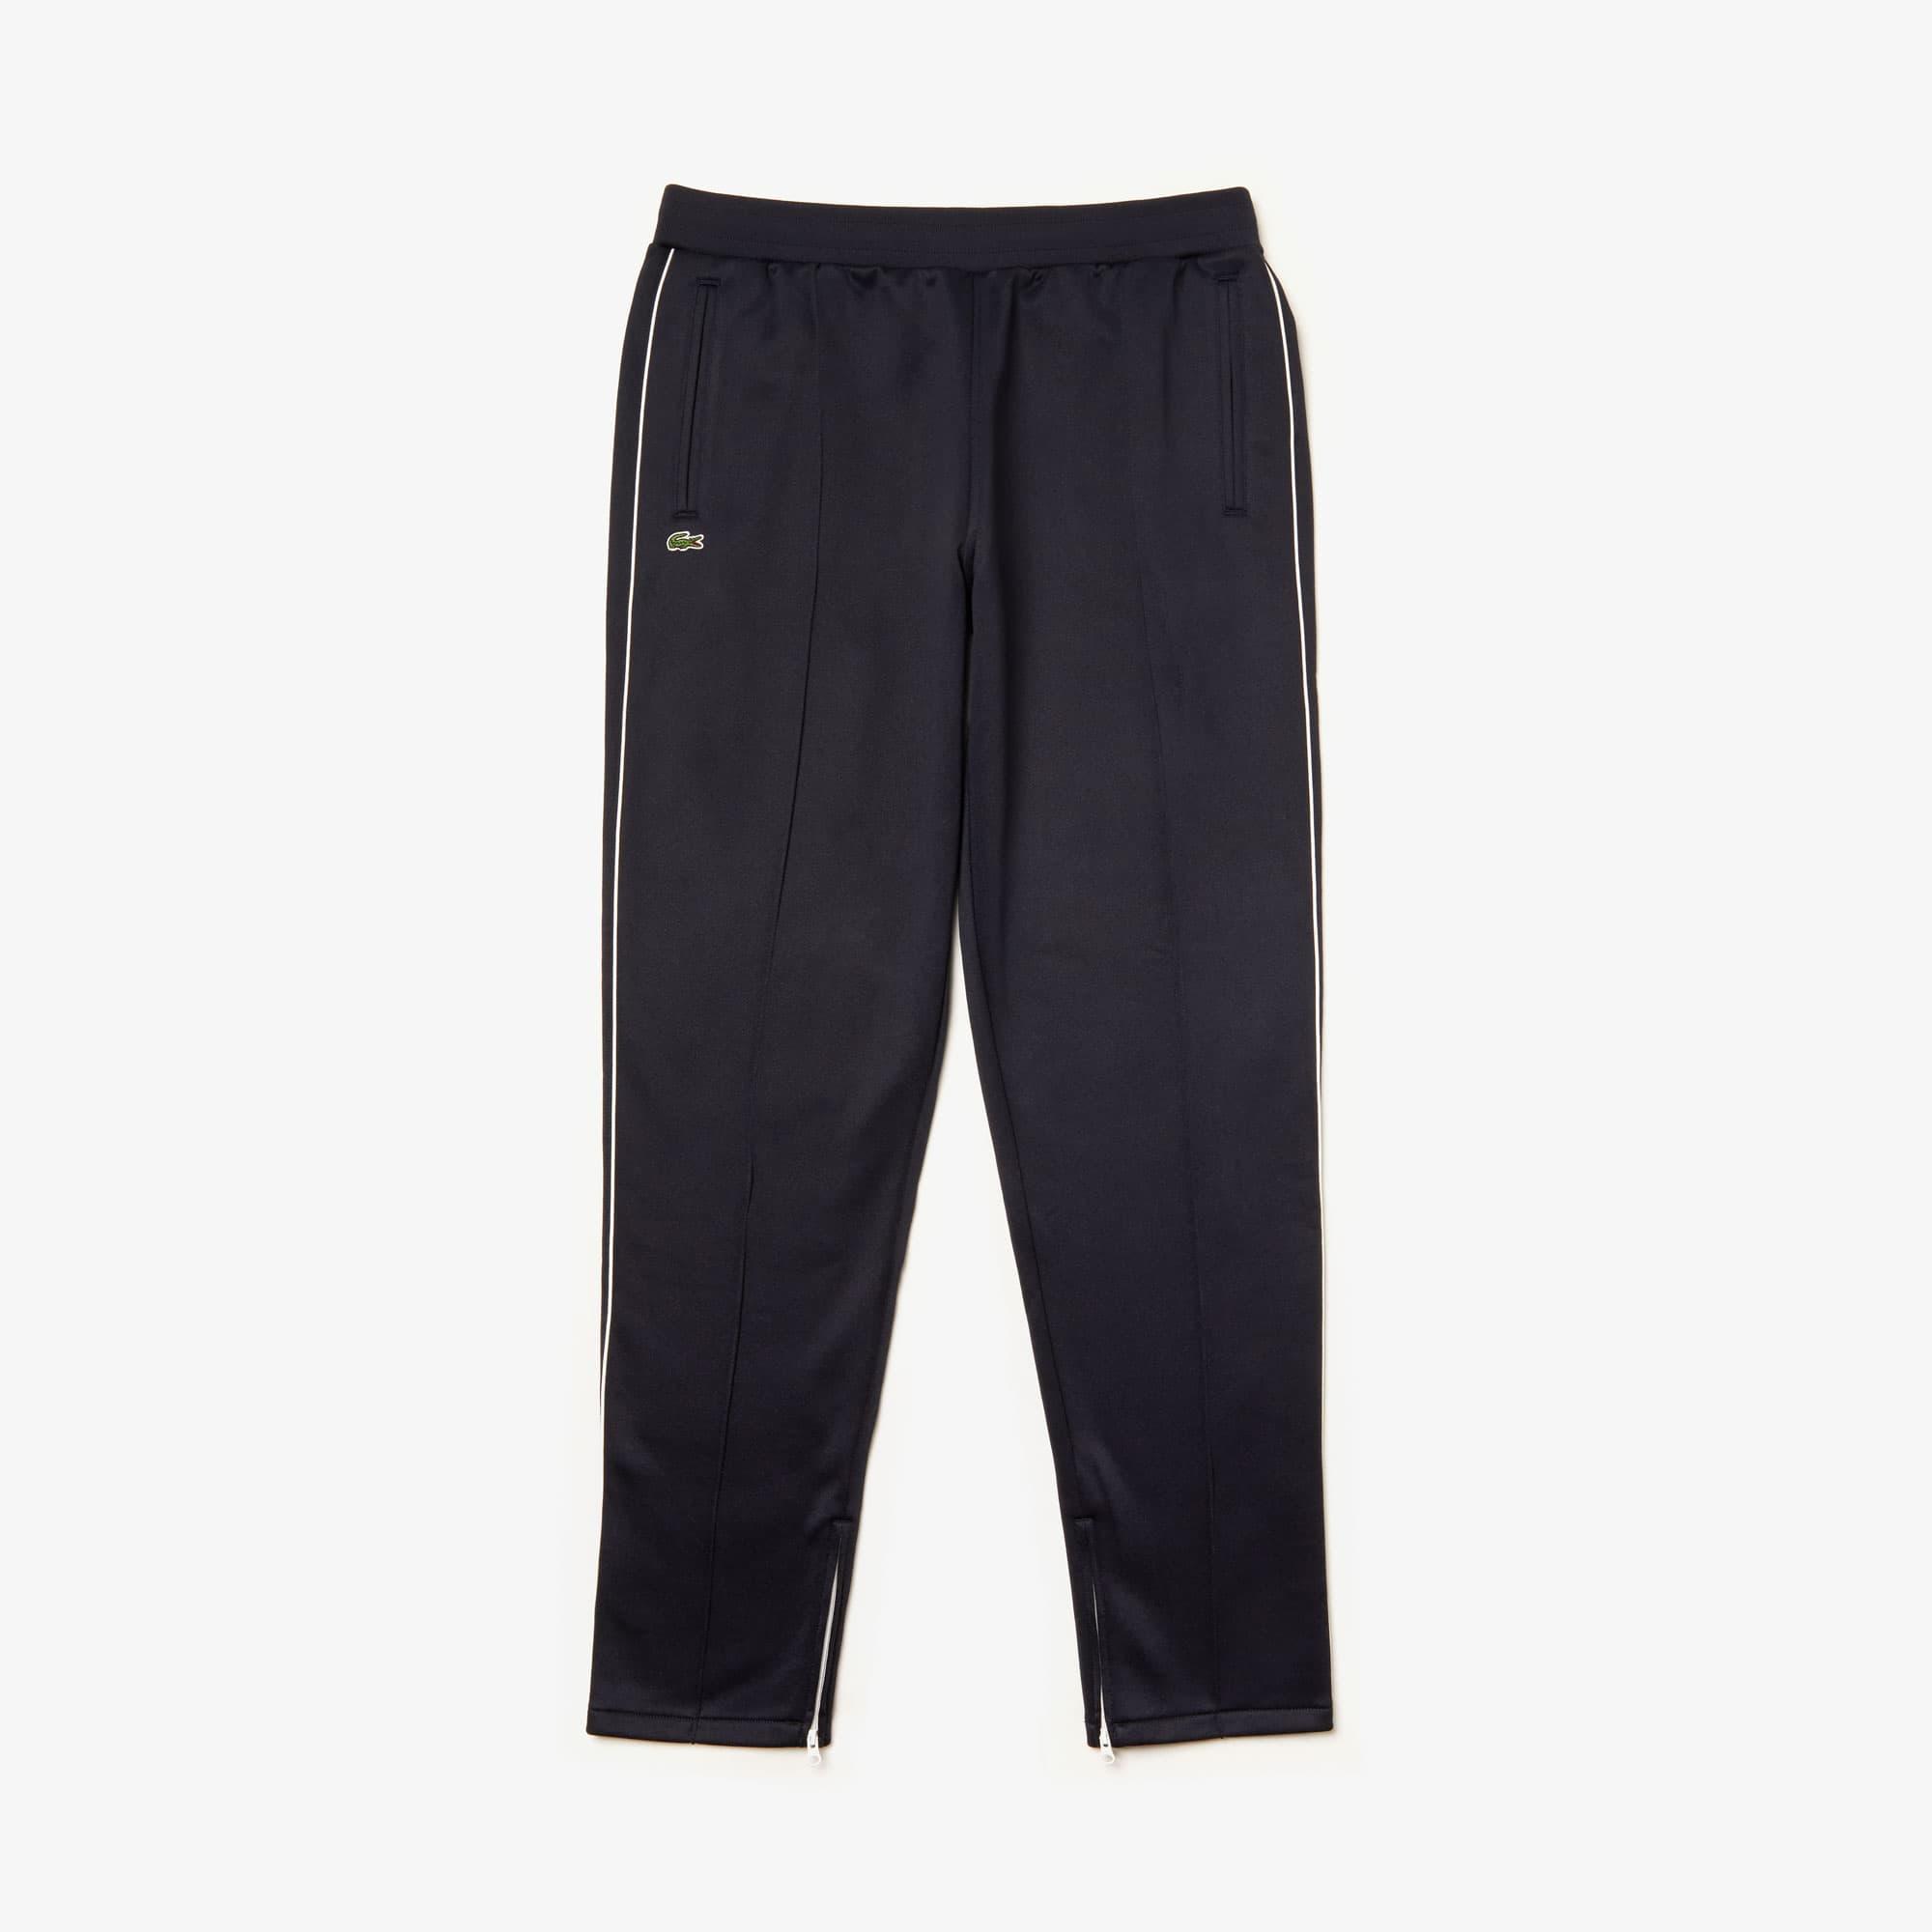 Lacoste Pants Men's LIVE Vintage-Inspired Sweatpants